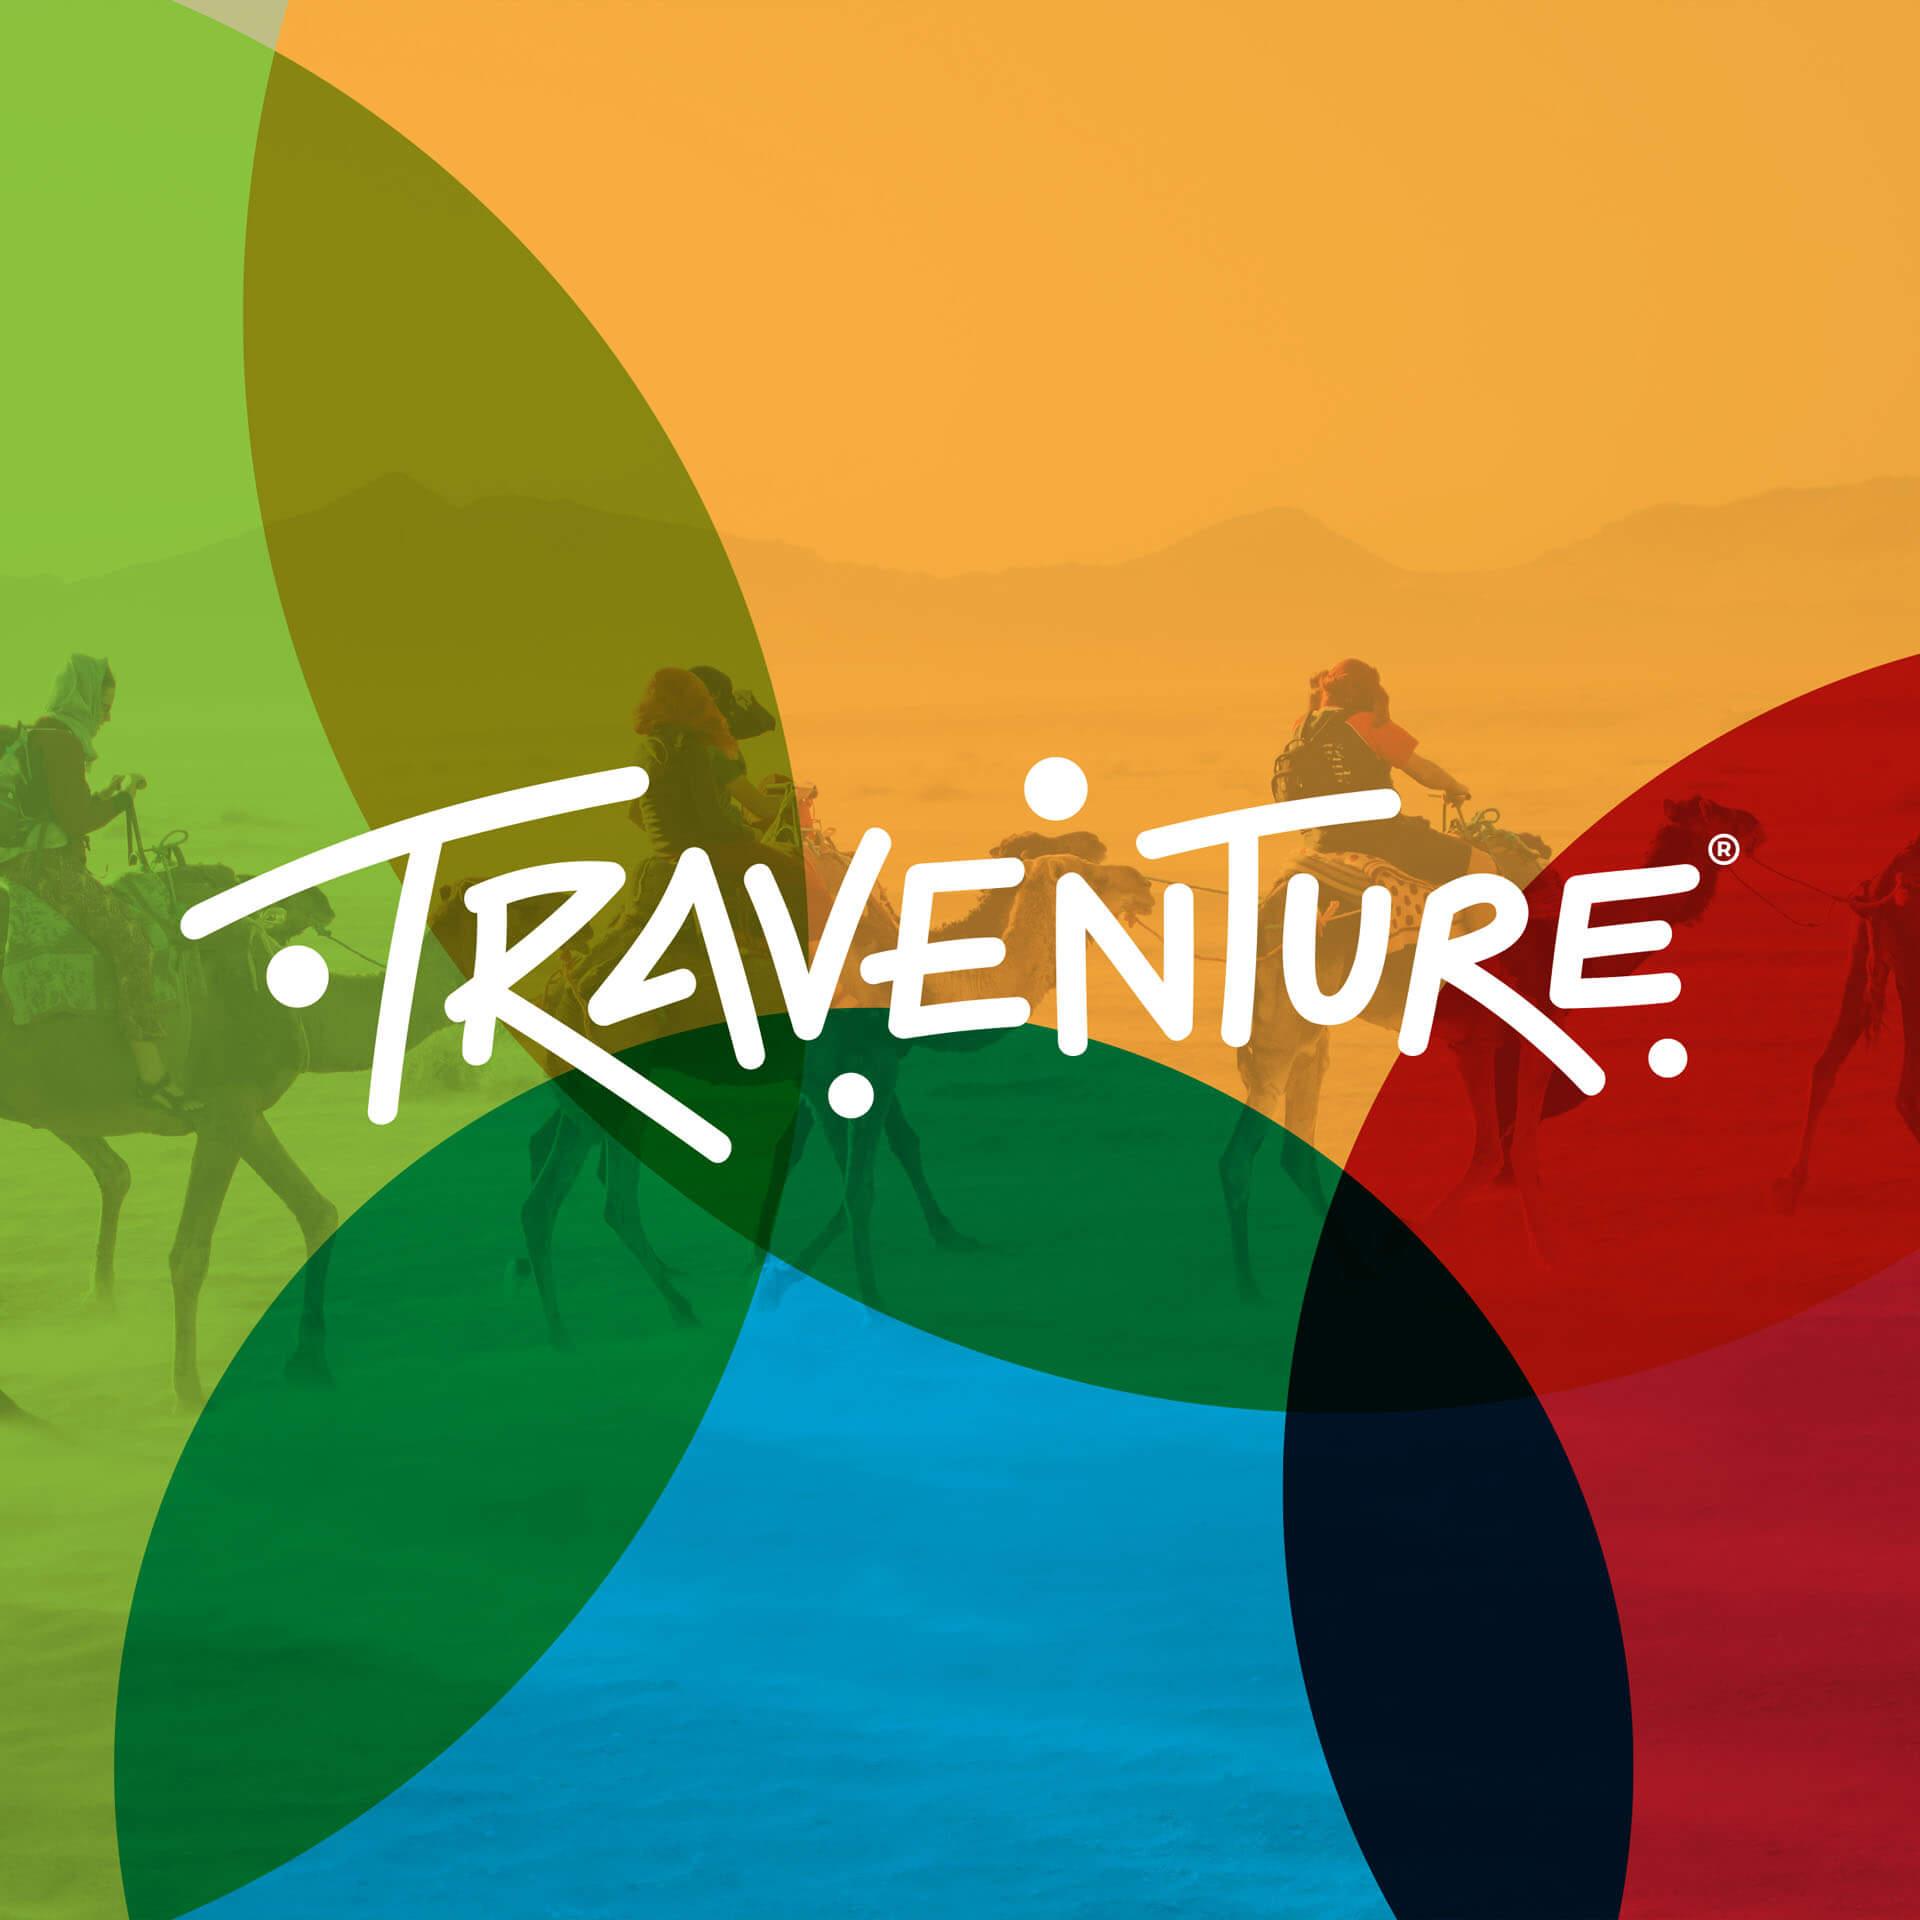 Traventure